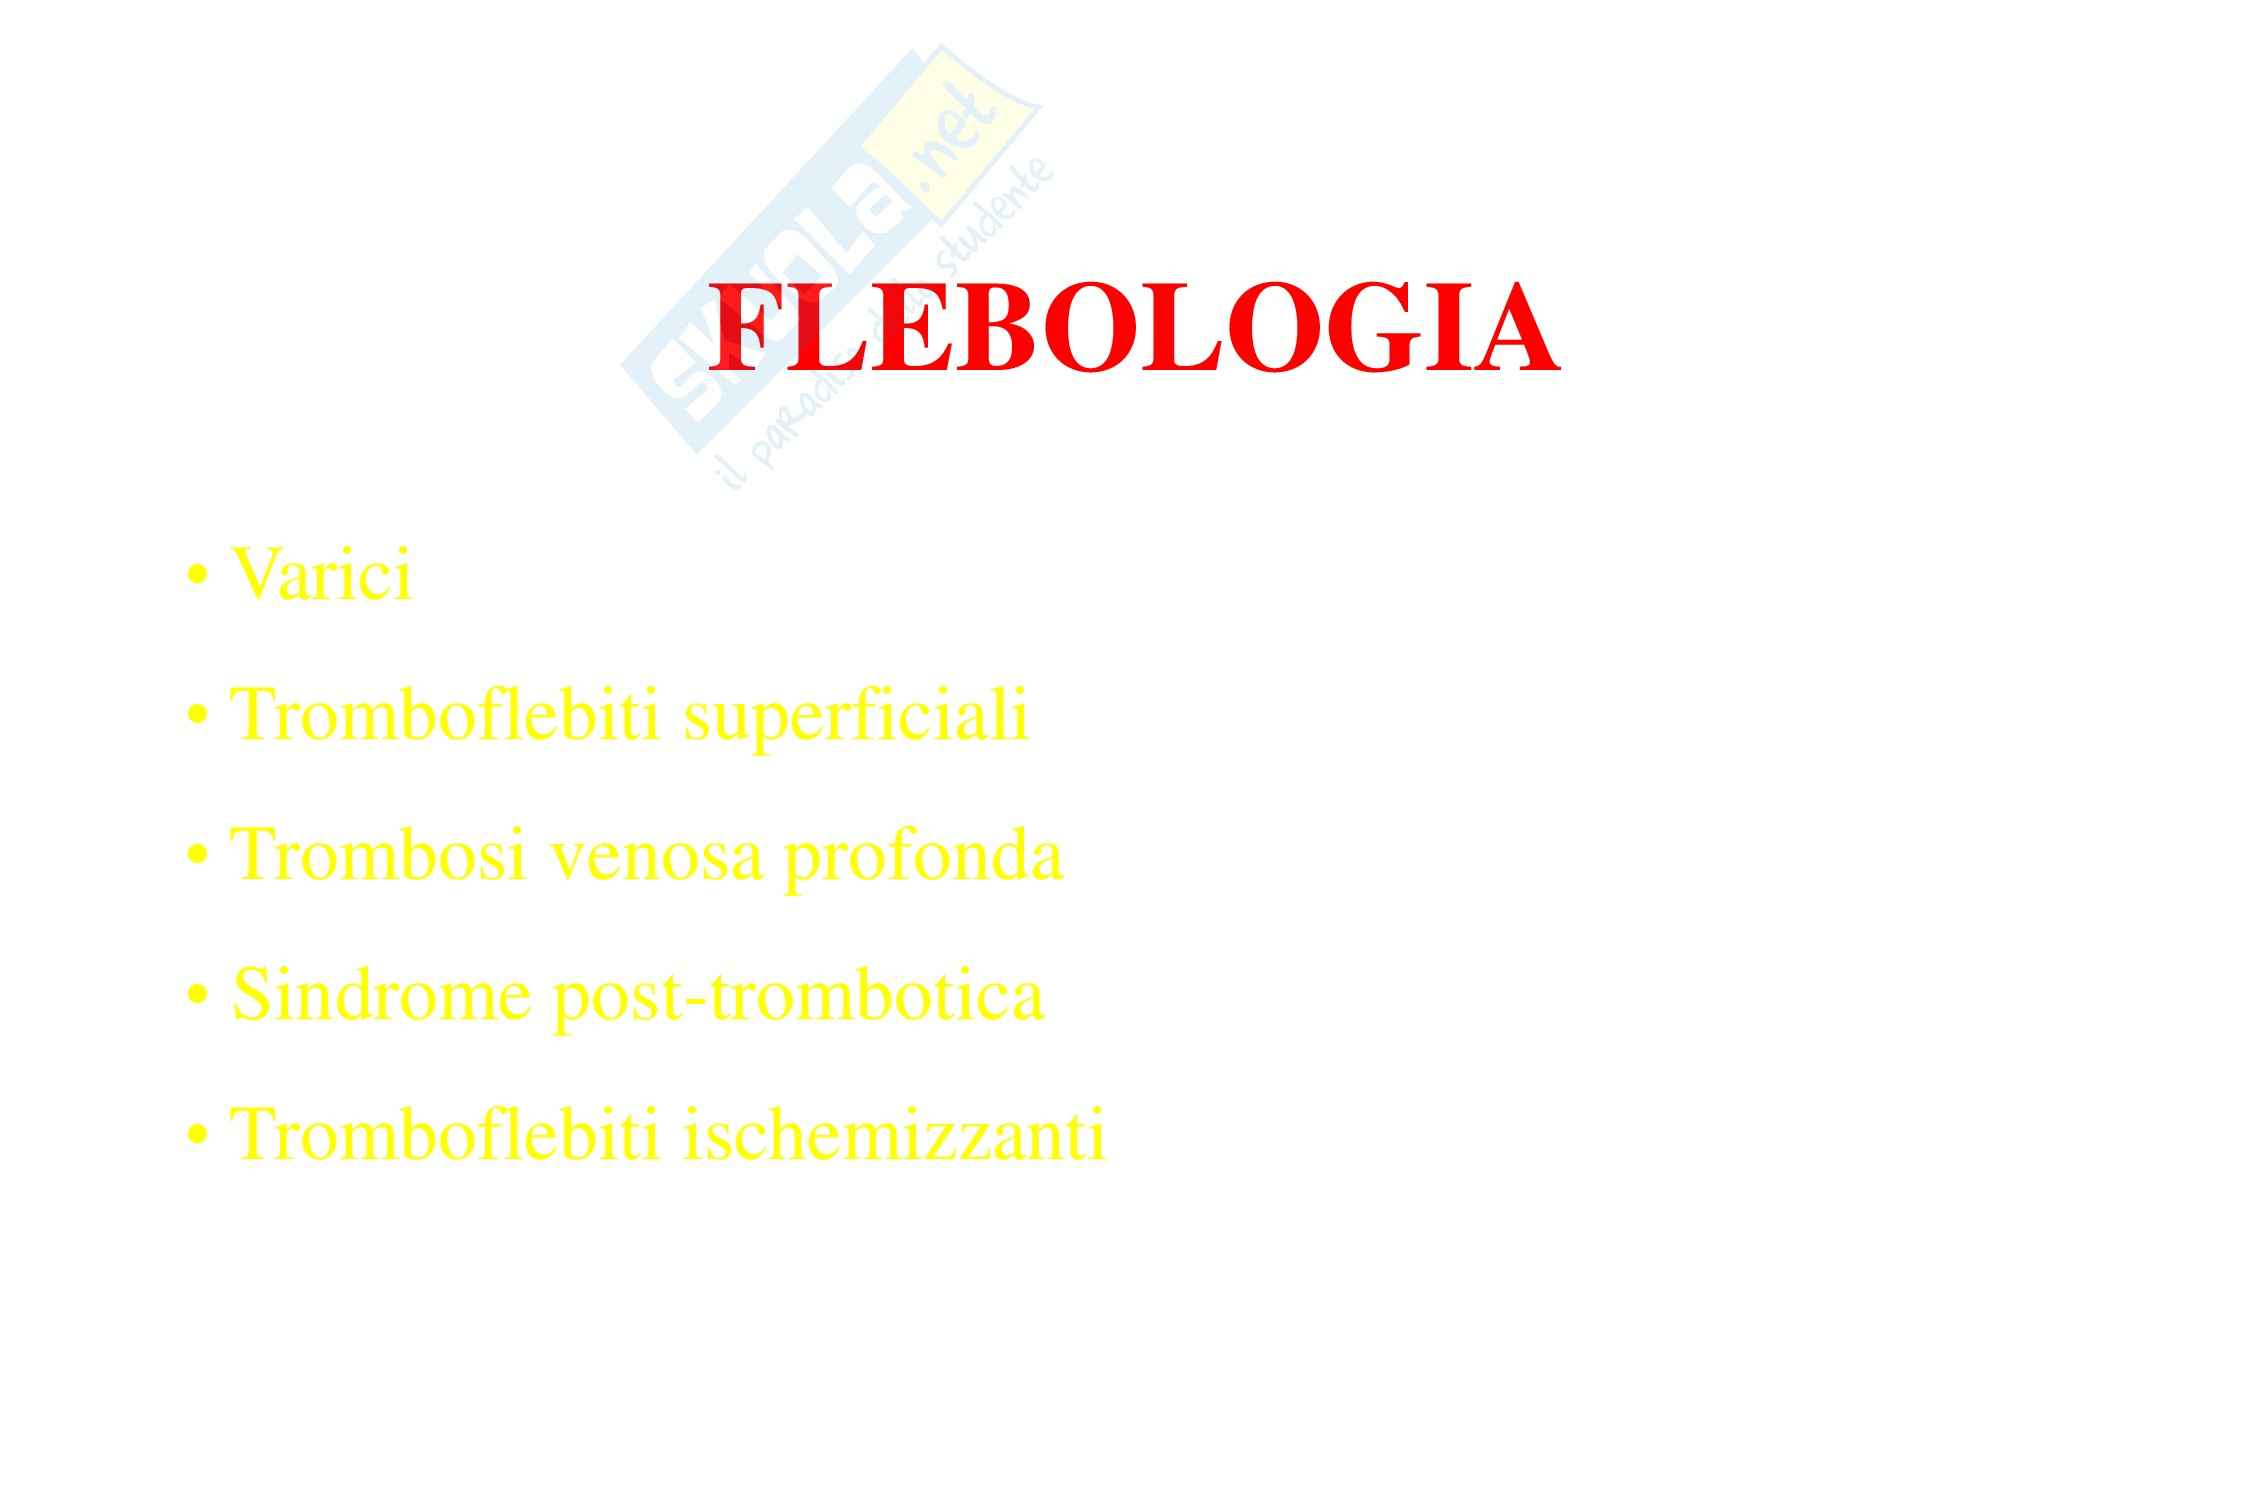 Cardiochirurgia - flebologia